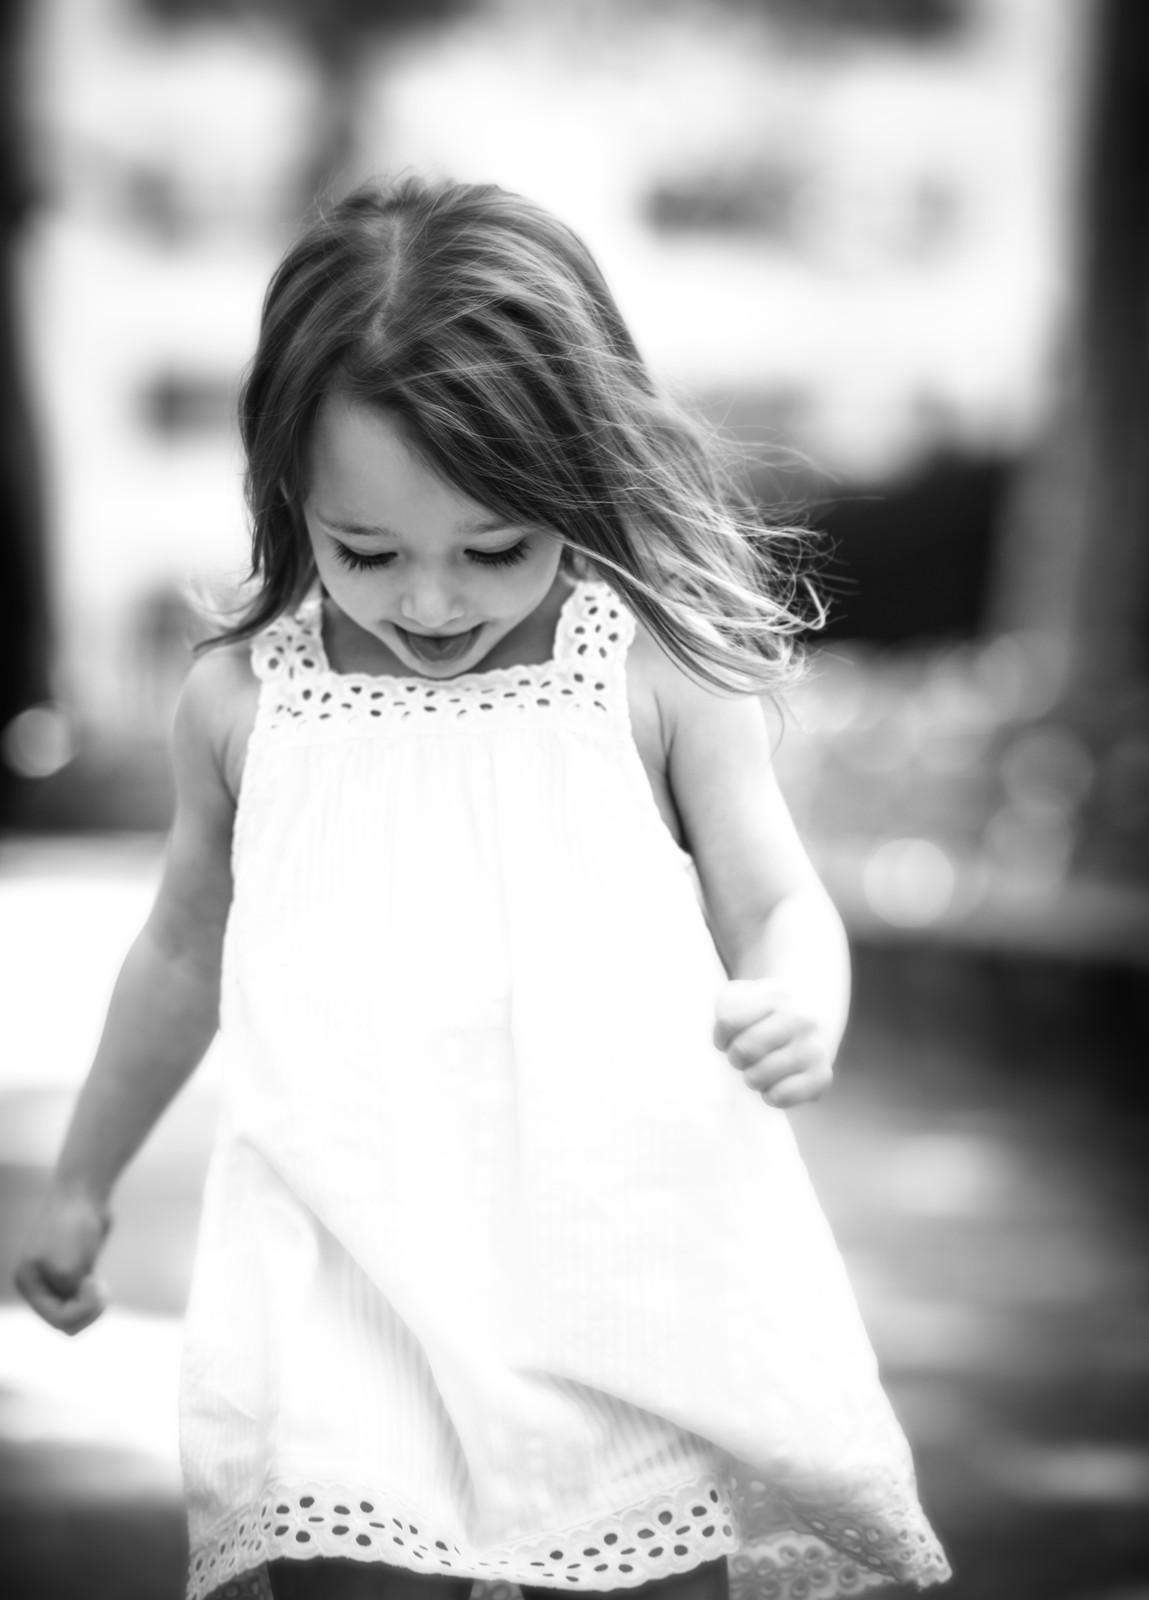 Childrens portraits new york city black and white tammy tarabola